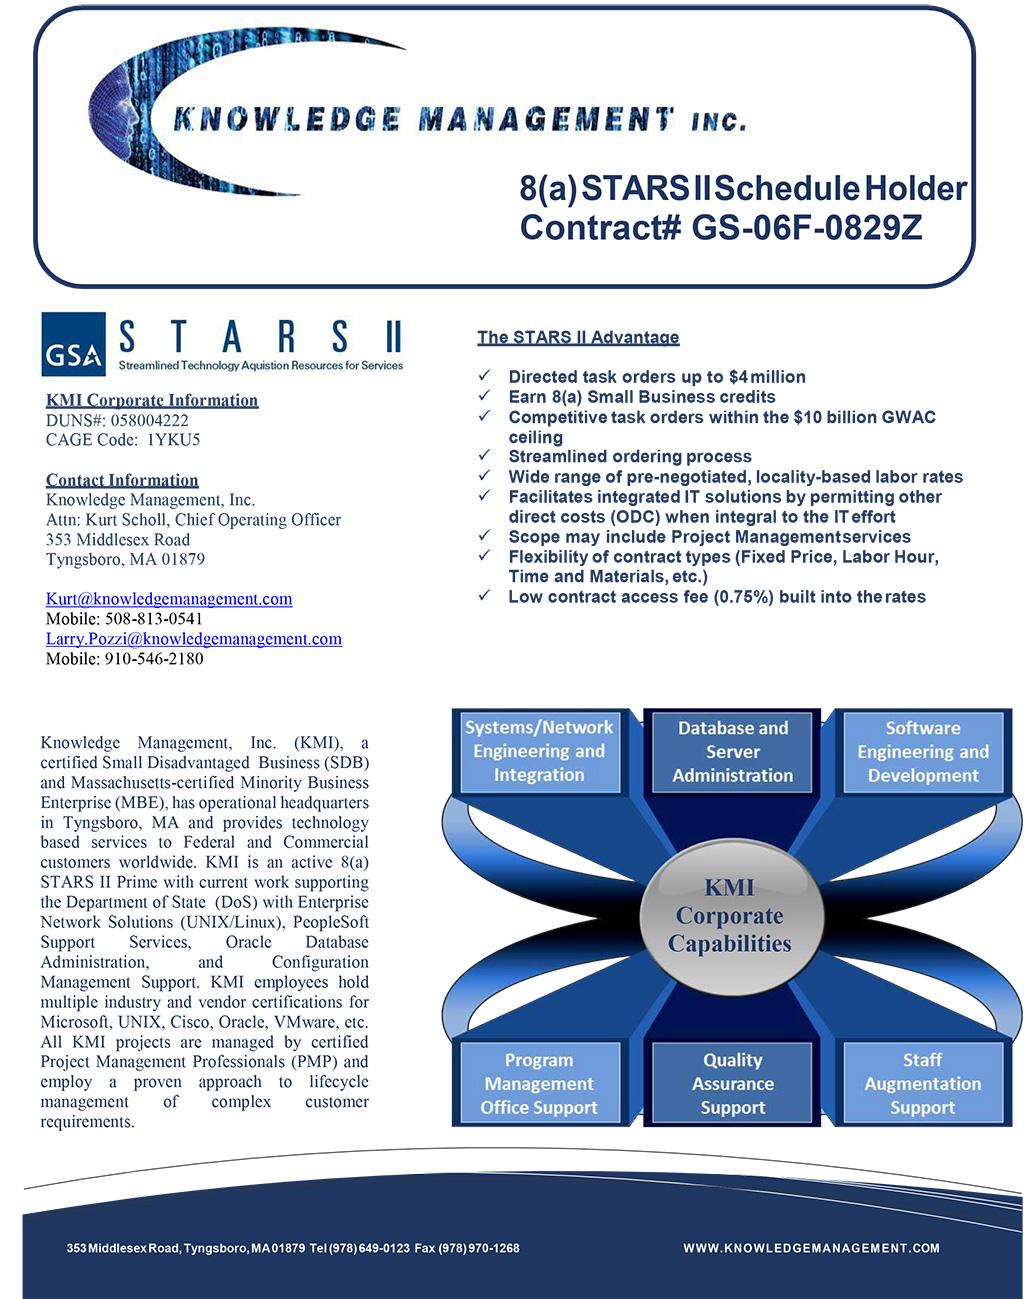 KMI-8(a)-STARS-II-Datasheet-22-March-2019-1